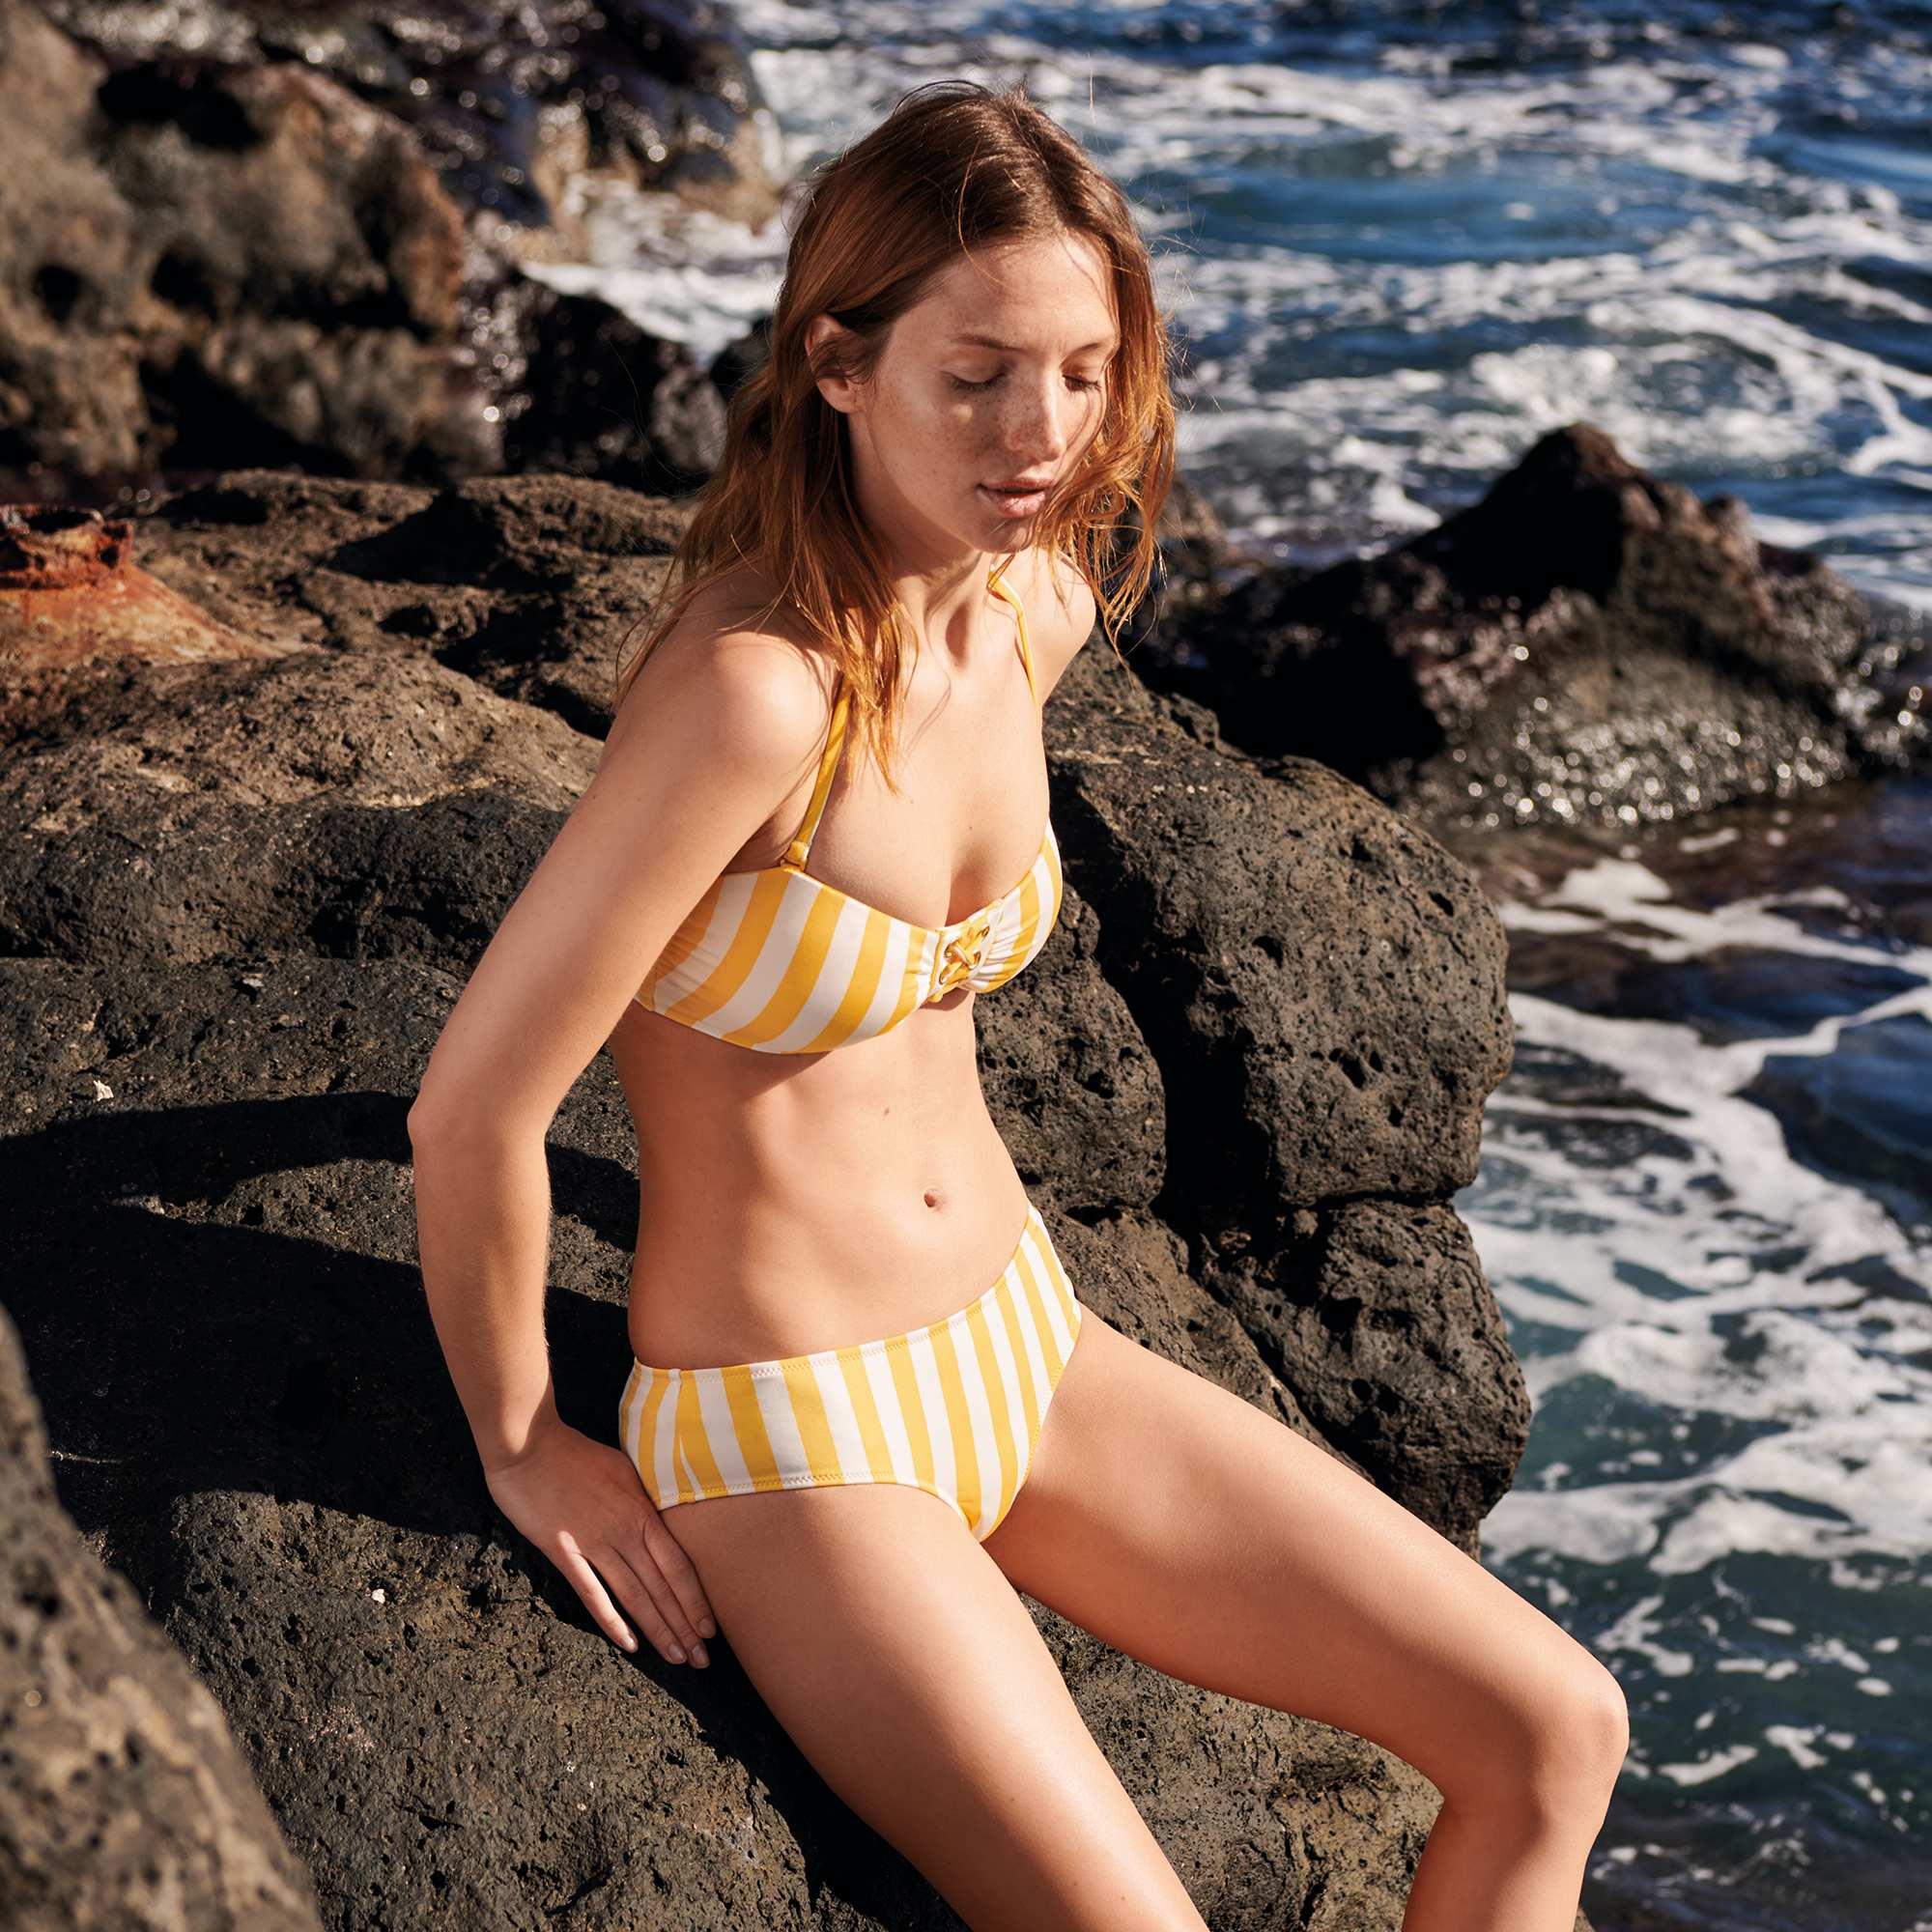 Culotte A Culotte De De Culotte Rayas Rayas A Bikini De Bikini EQCeWrdxBo